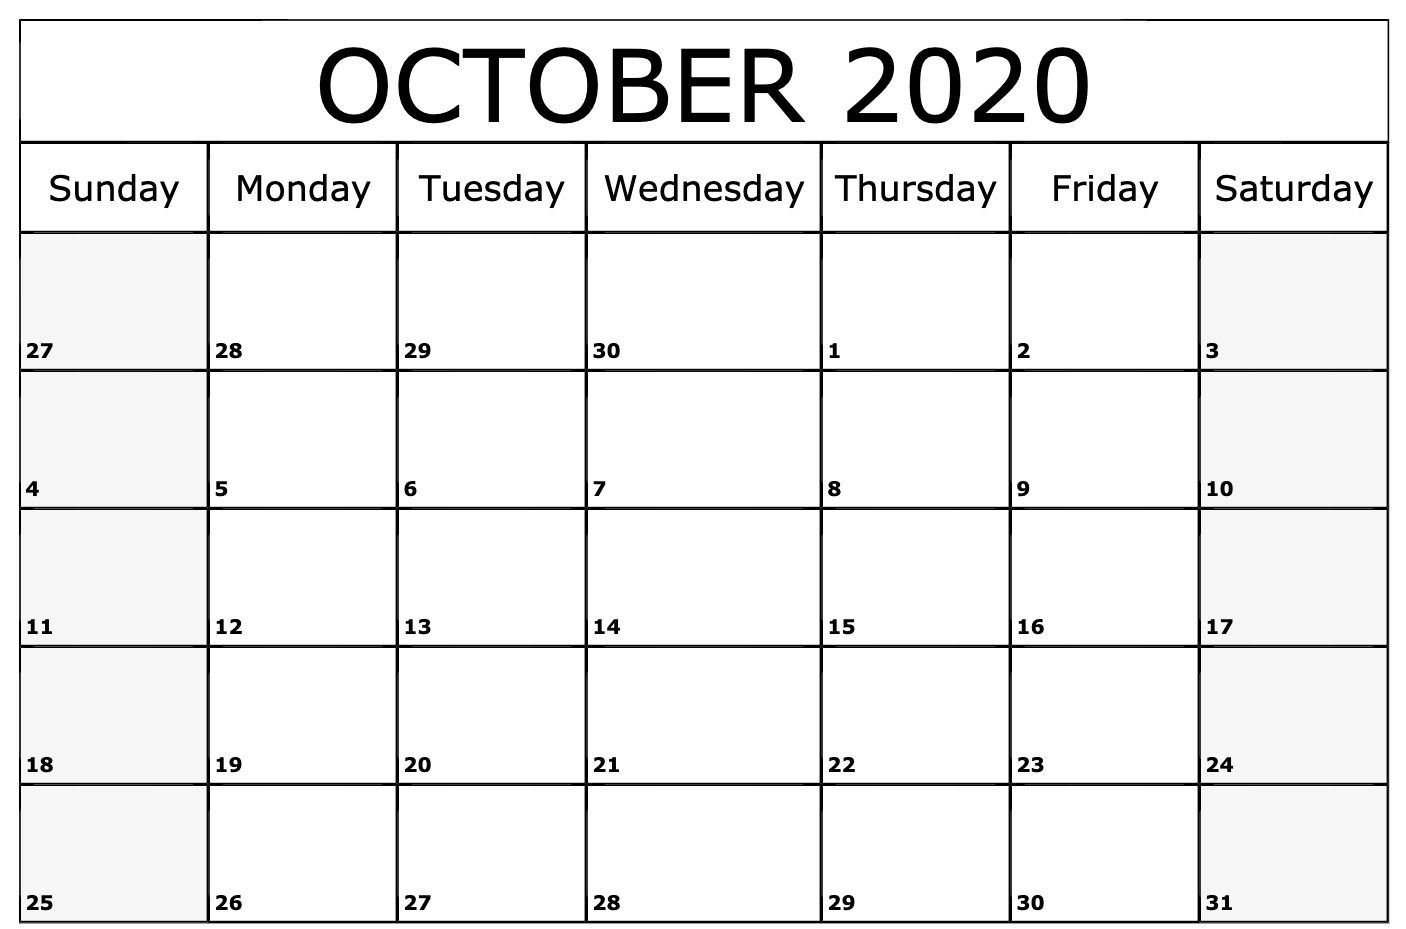 2020 October Calendar | Monthly Calendar Template, Printable